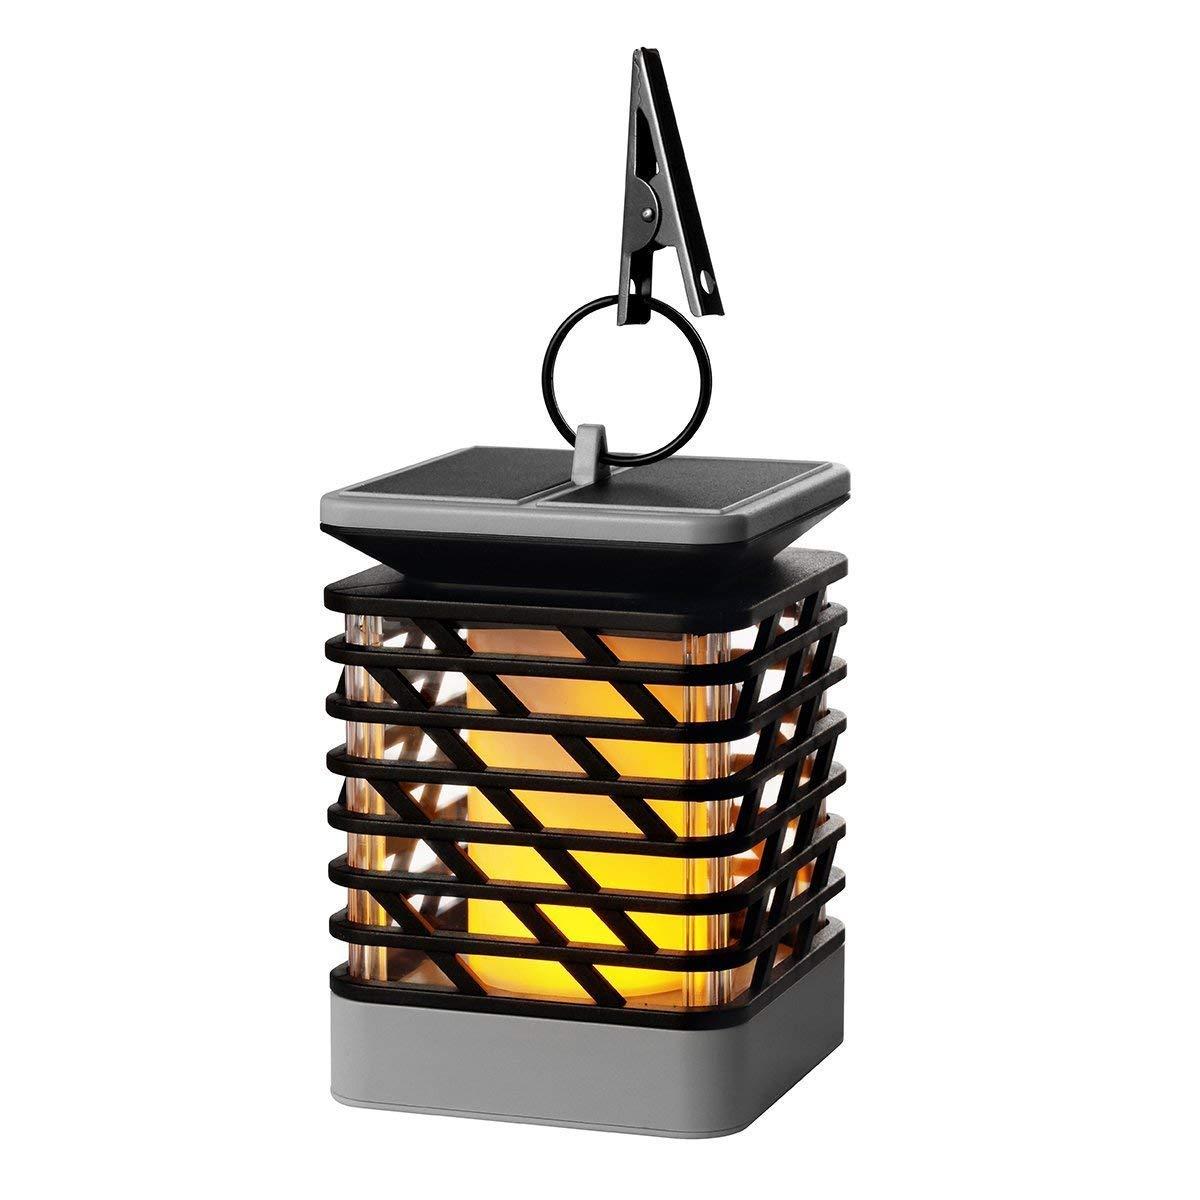 Baianf Luci solari all'aperto Espier LED Flickering Flame Torch Lights Lanterna ad energia Solare Hanging Natale Festa per Feste Impermeabile Auto On off Lampada Decorativa Atmosfera per Pathway Gar